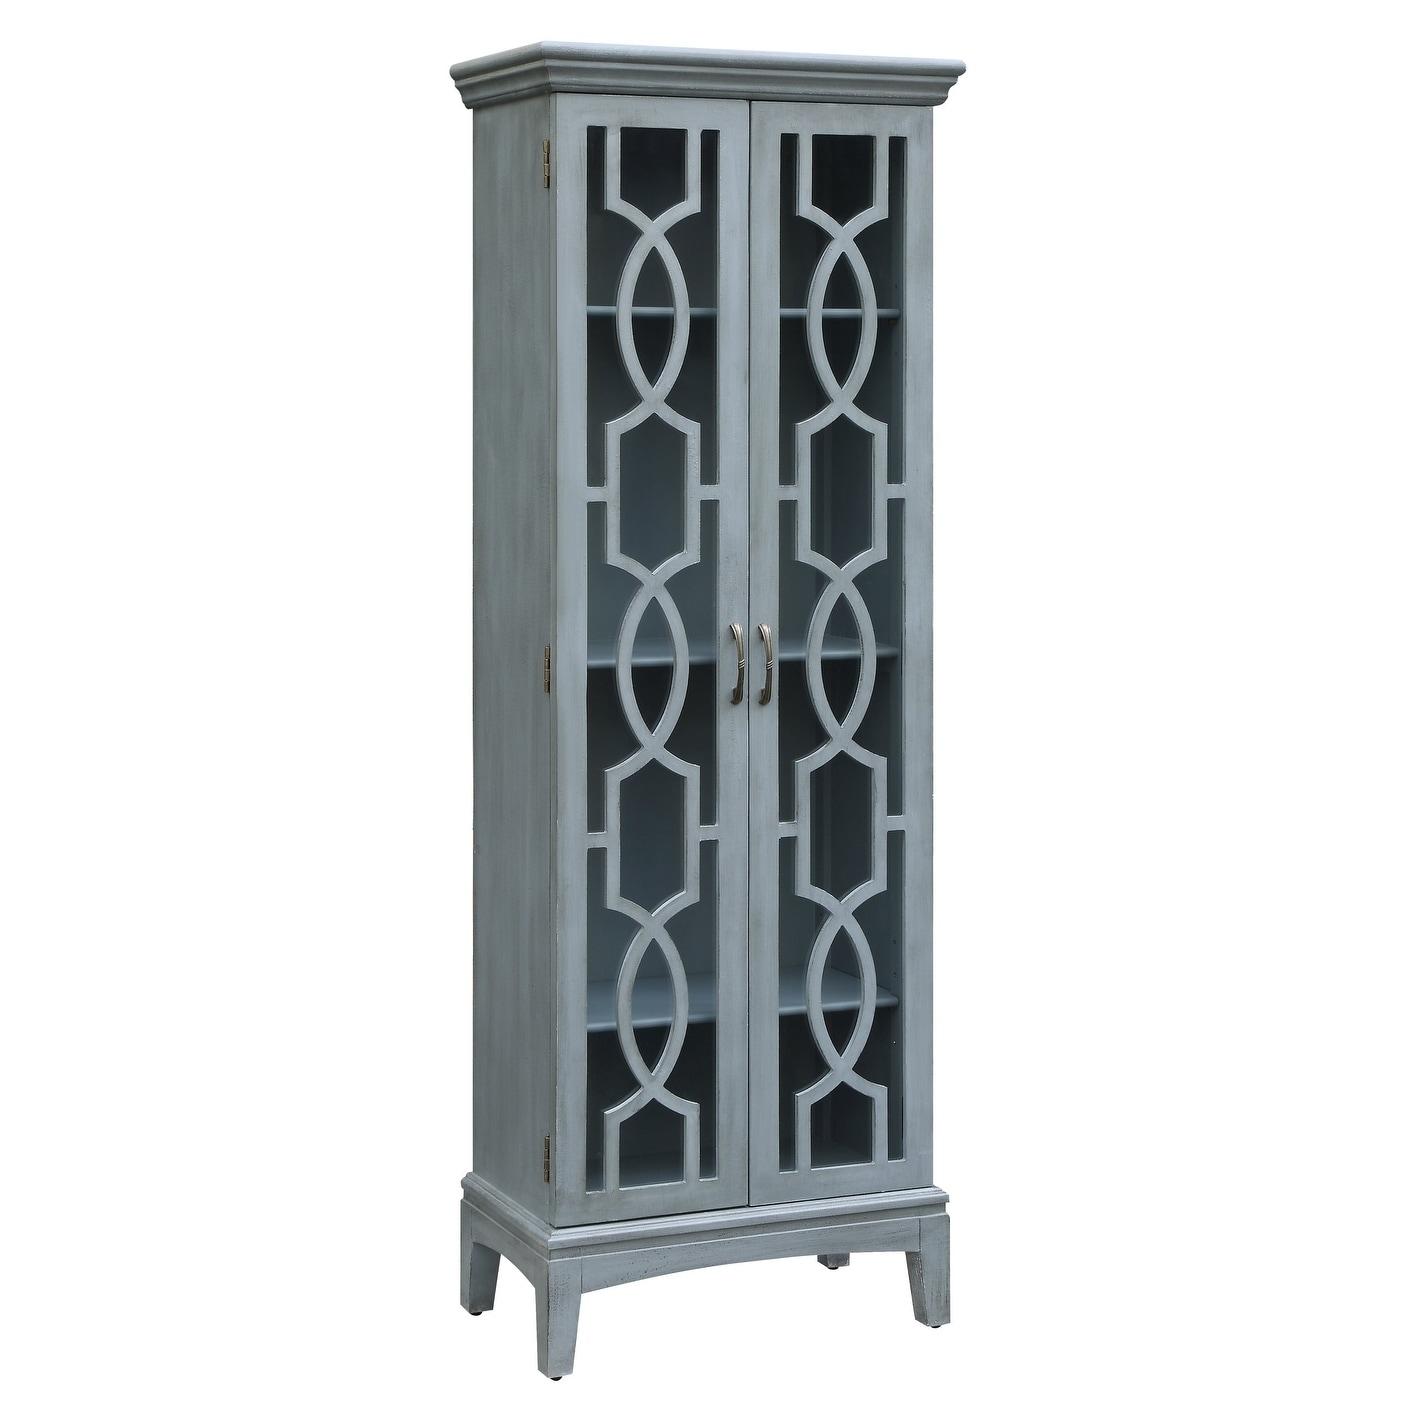 Sydney Blue 2 Door Tall Cabinet Overstock 20695236